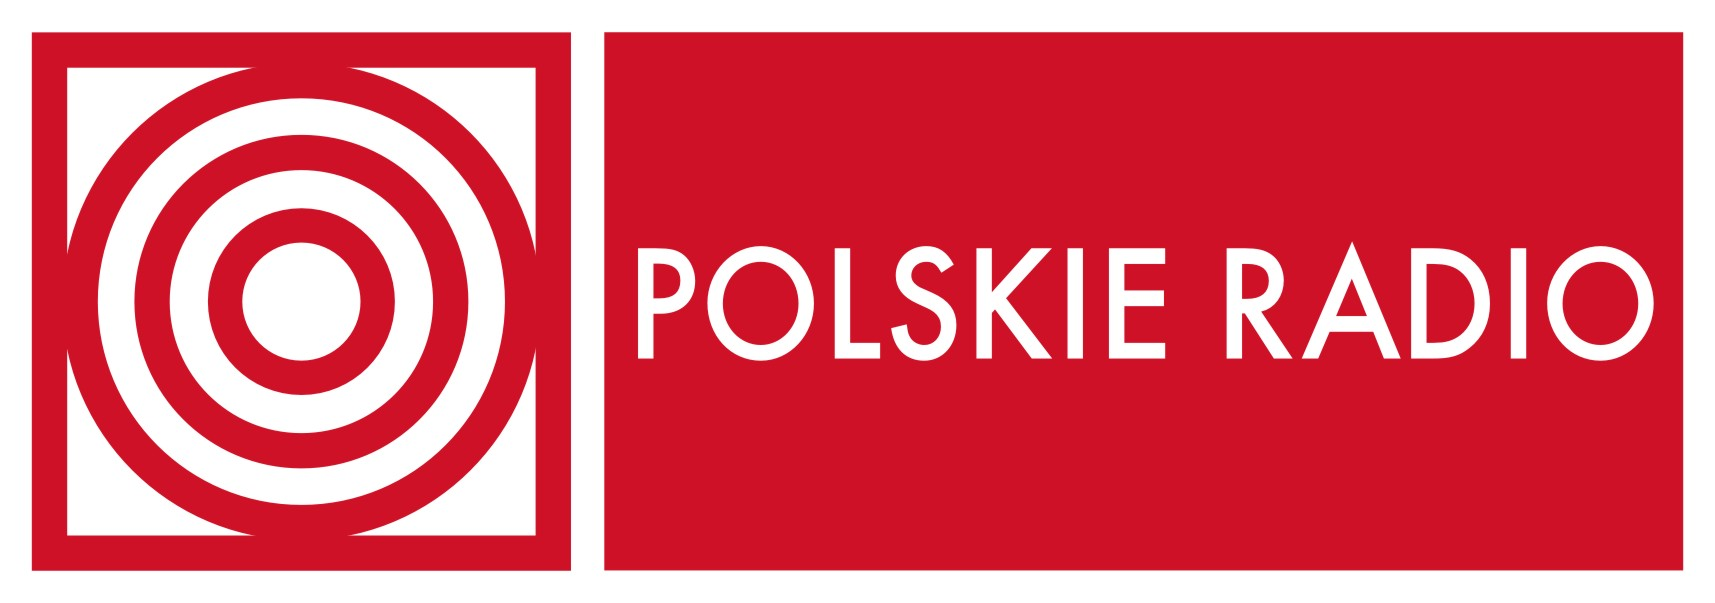 polskie_radio_1_4